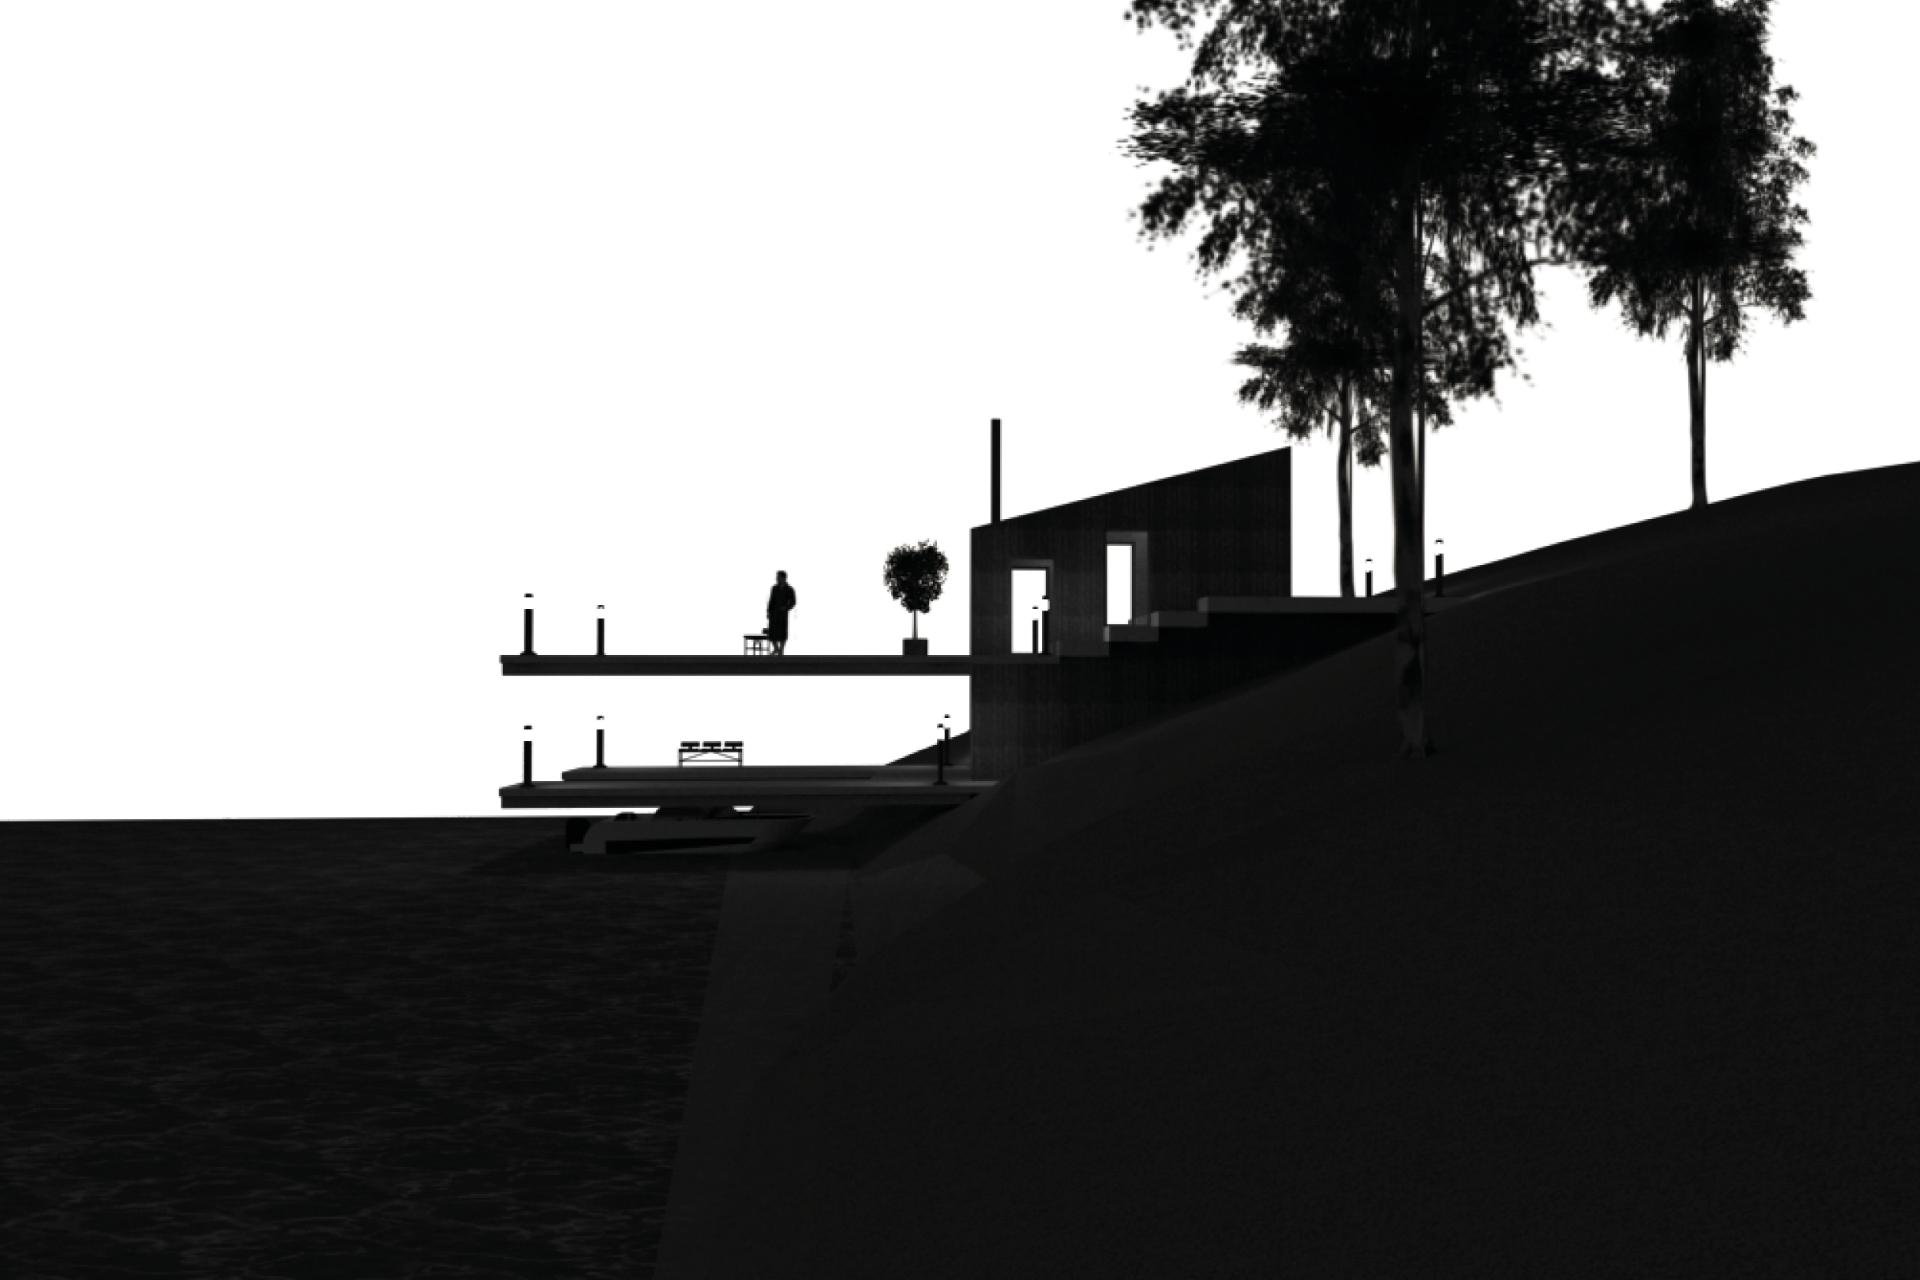 vbmbb-projekt01